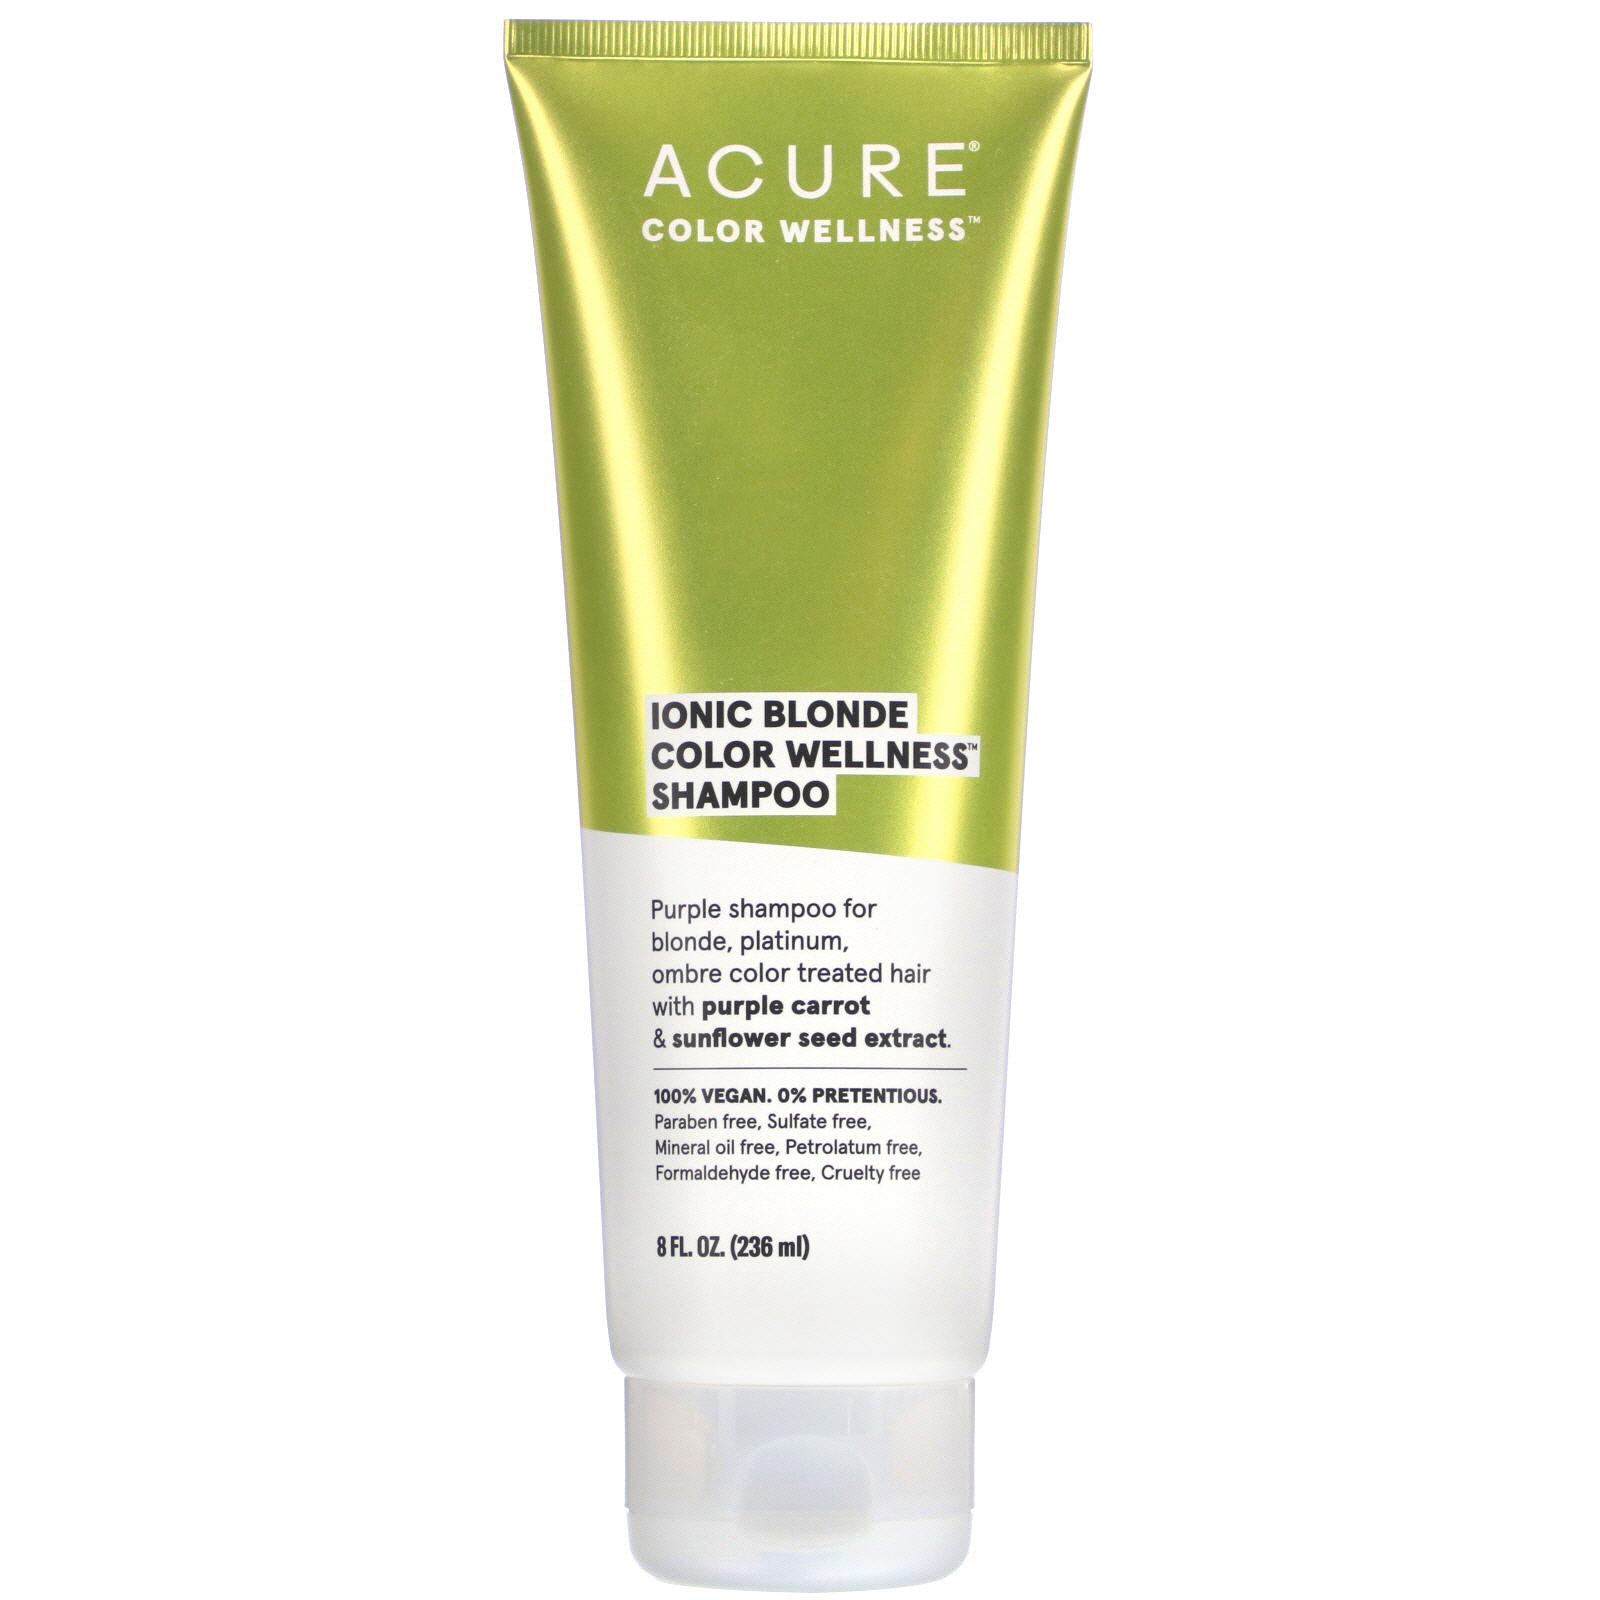 Acure, Ionic Blonde Color Wellness Shampoo, 8 Fl Oz (236